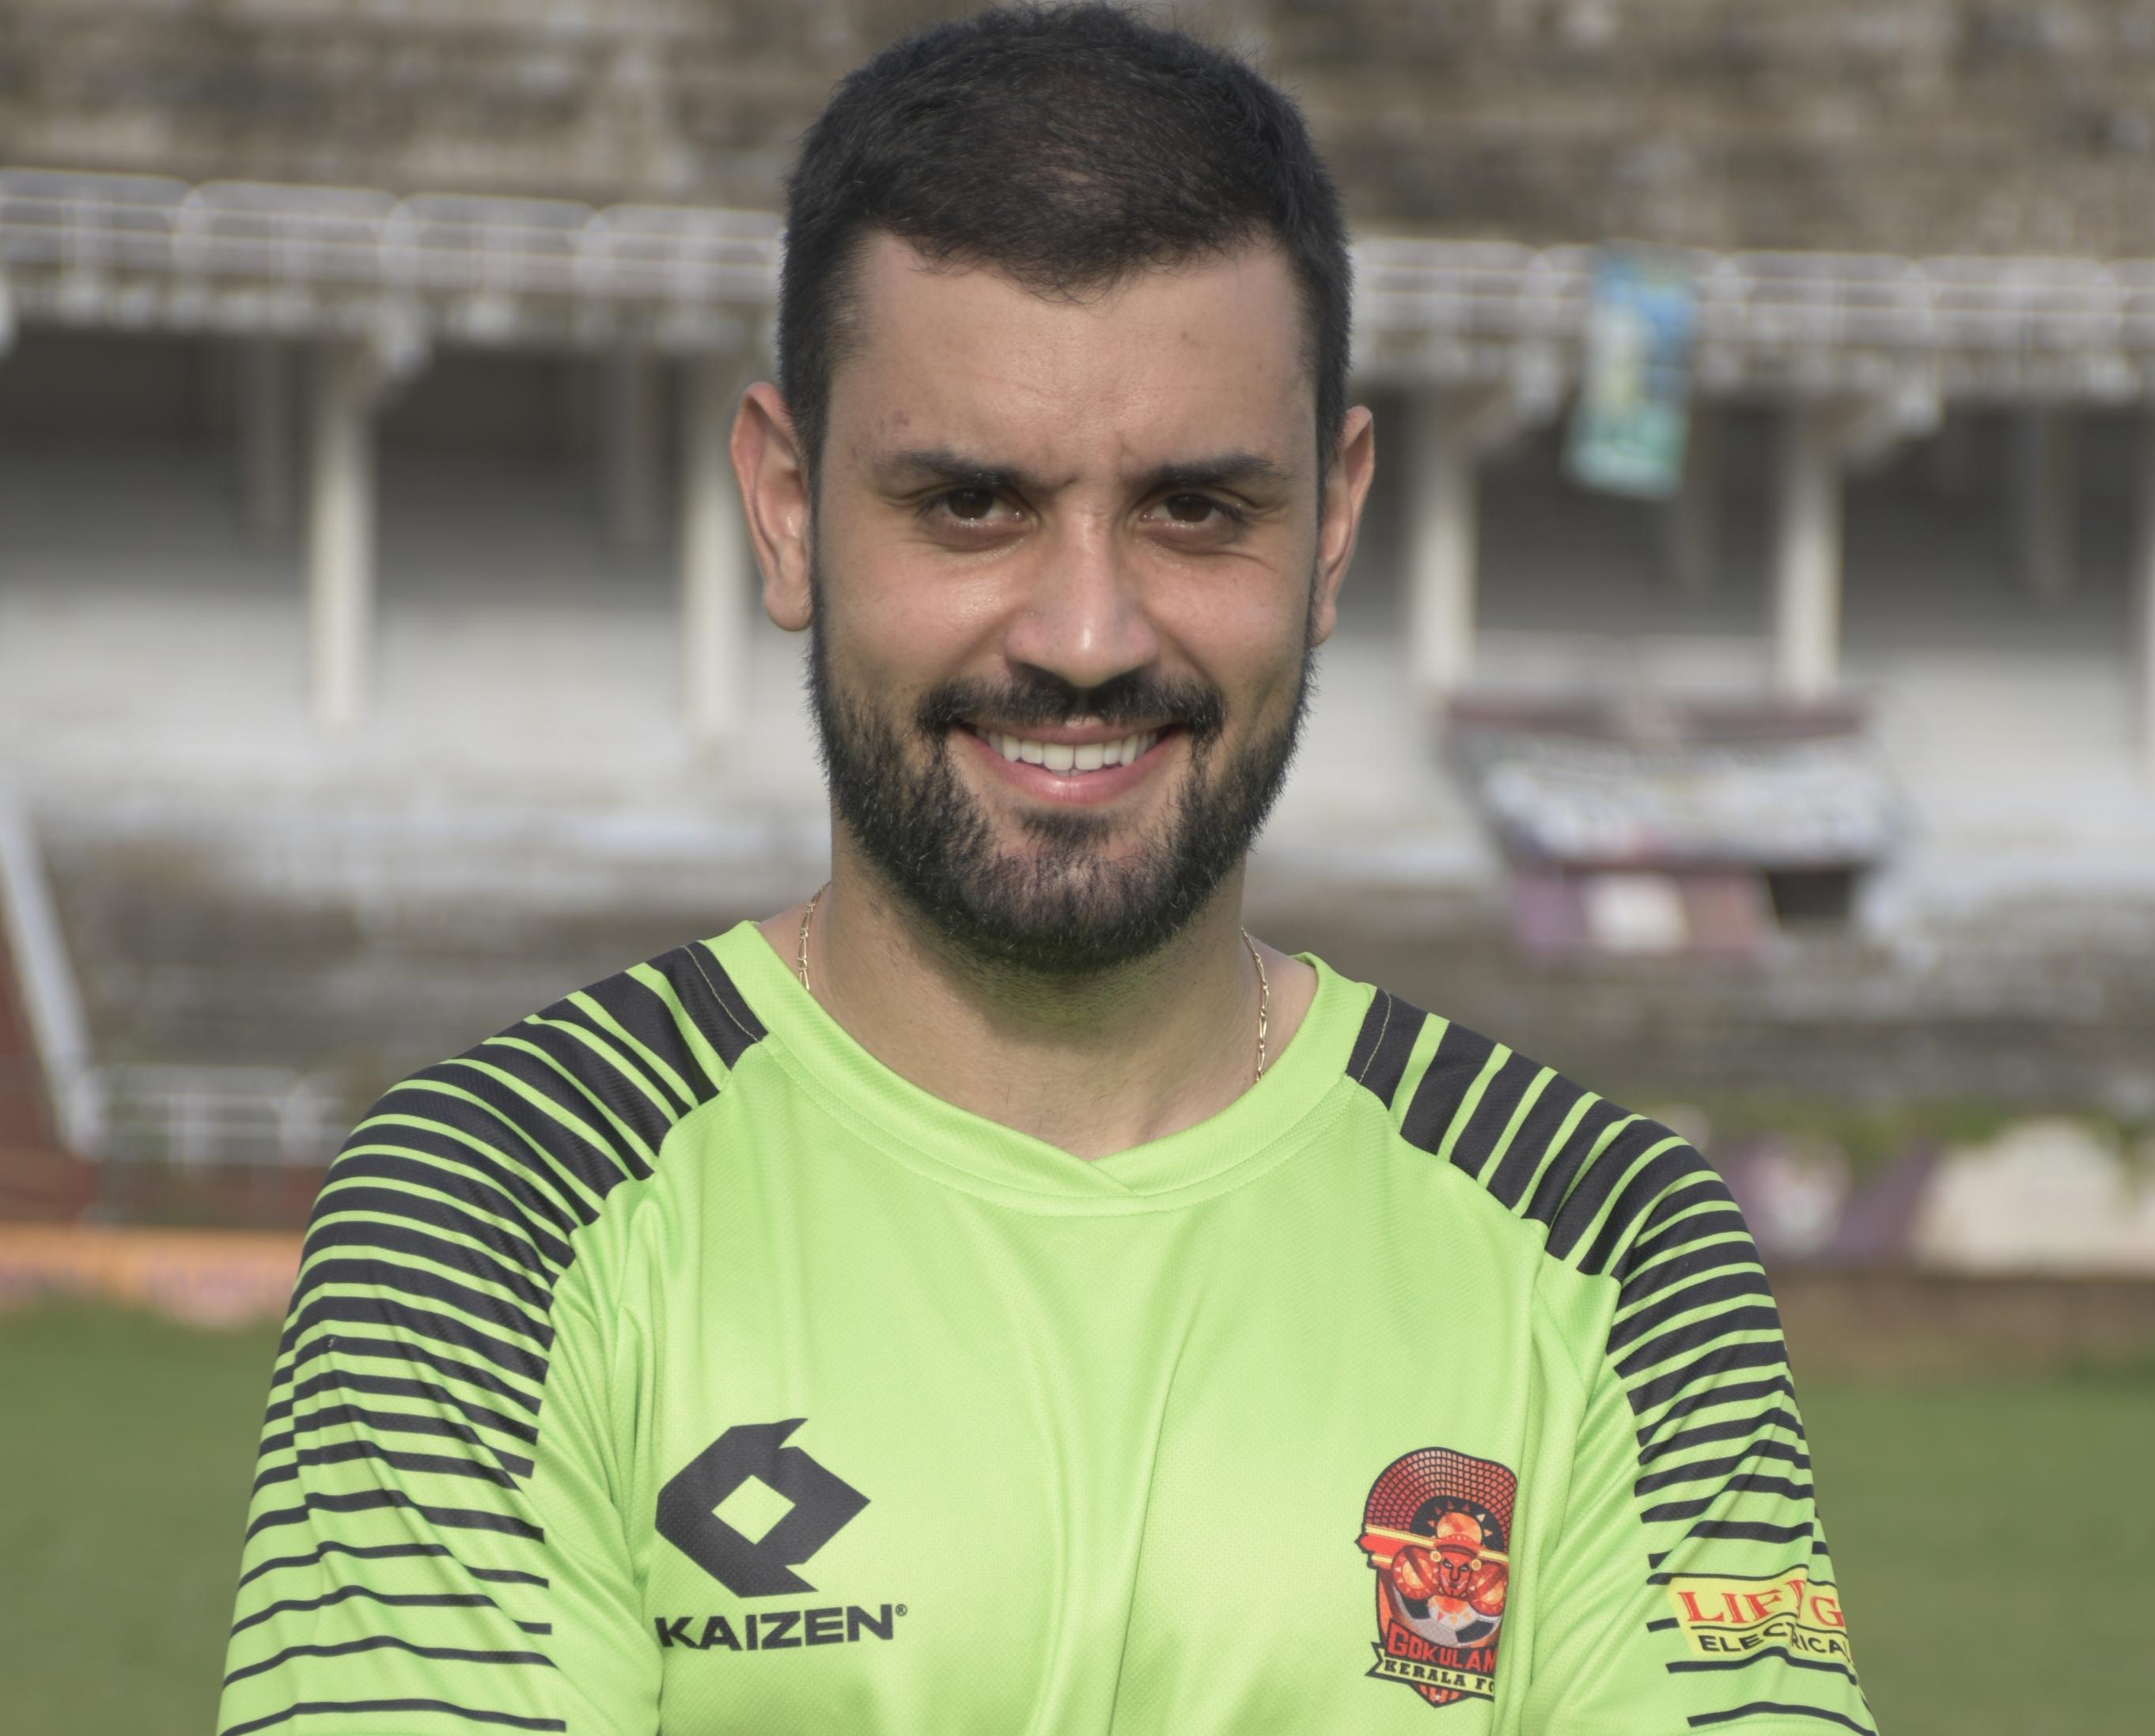 I-League: Gokulam Kerala can face any team in India, says Bruno Pelissari